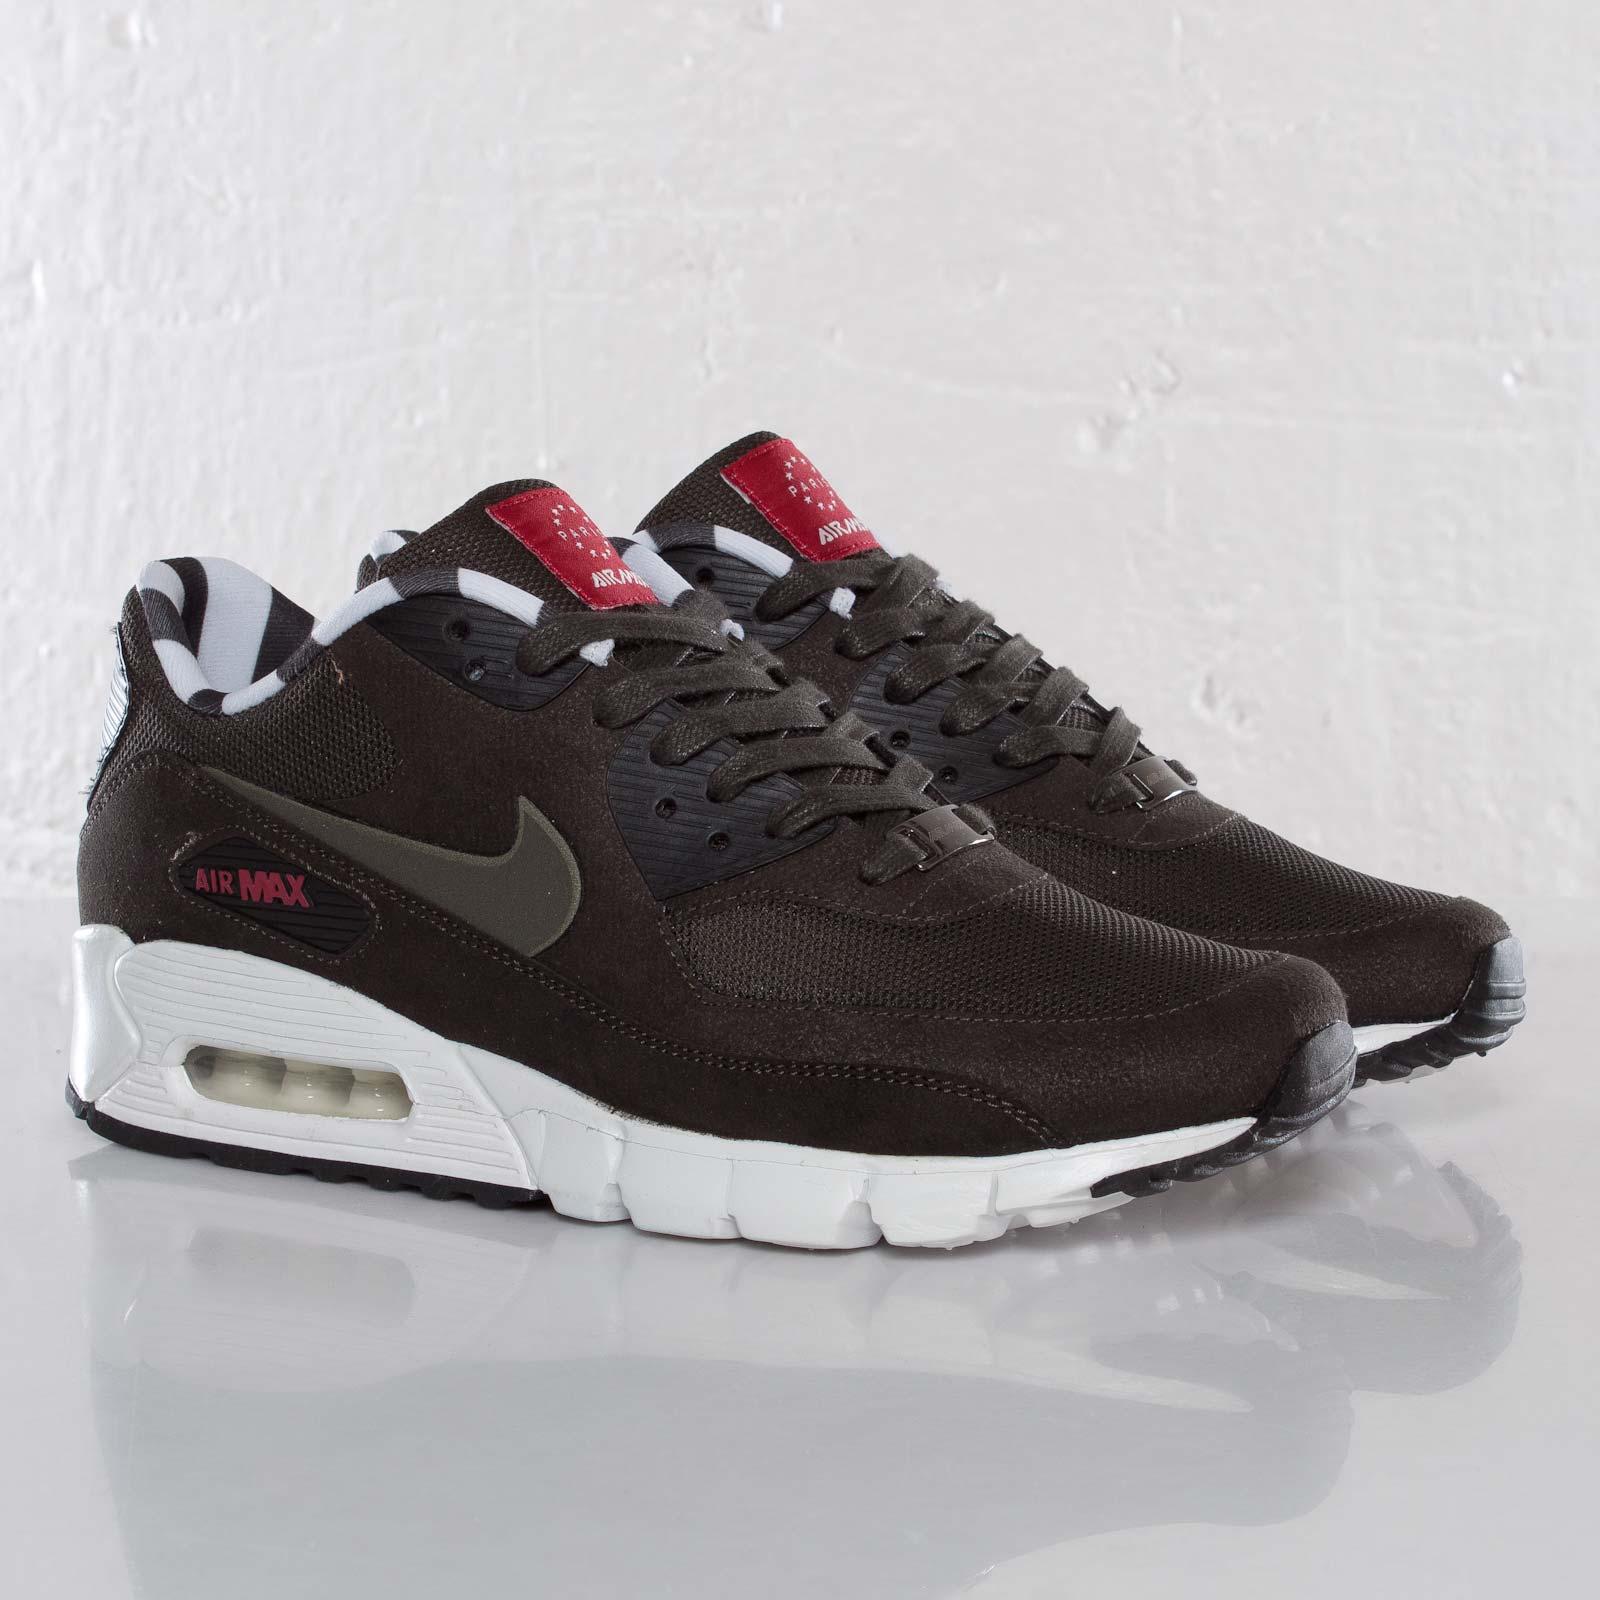 Nike Wmns Air Max 90 QS 813150 500 Sneakersnstuff